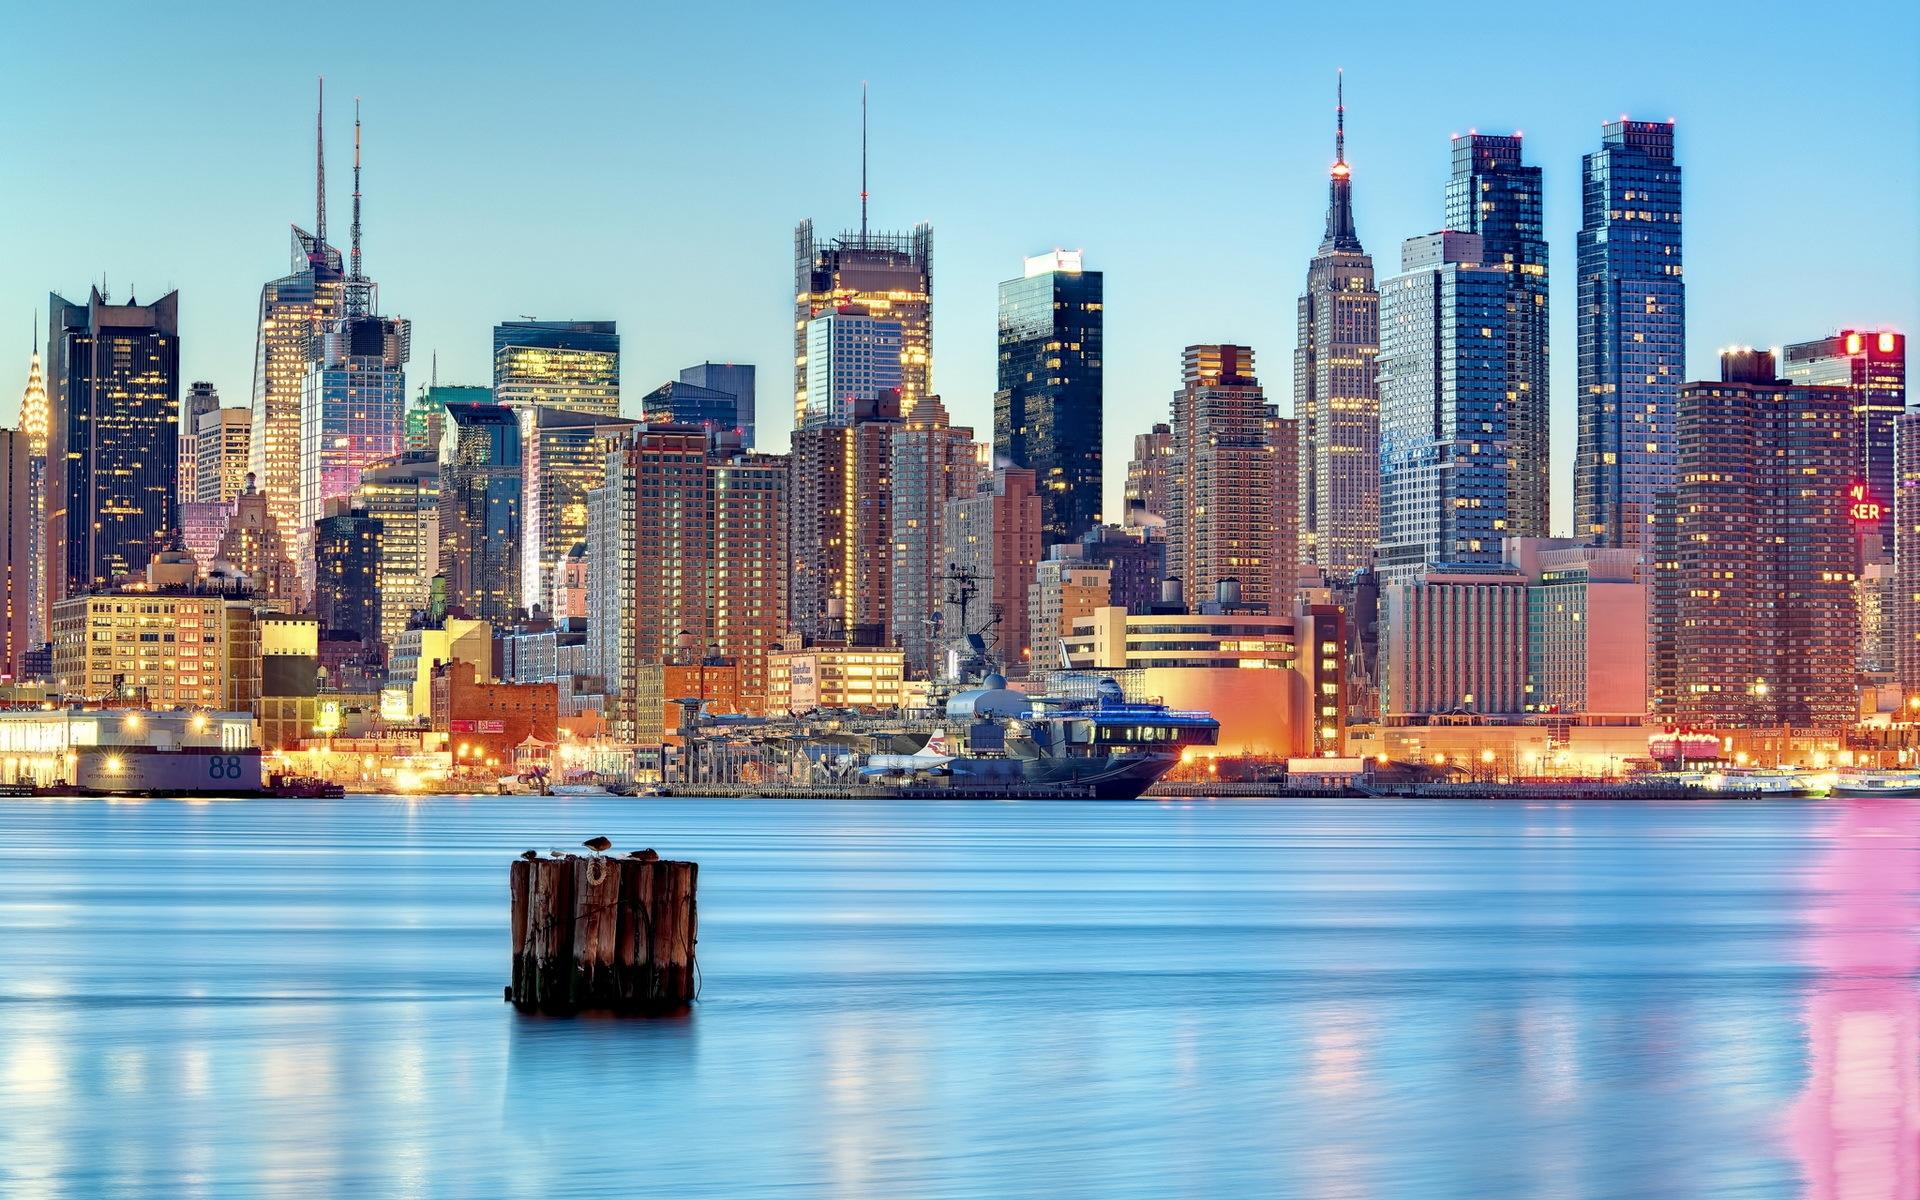 Wallpaper   City  Cityscape  Night  Reflection  Skyline